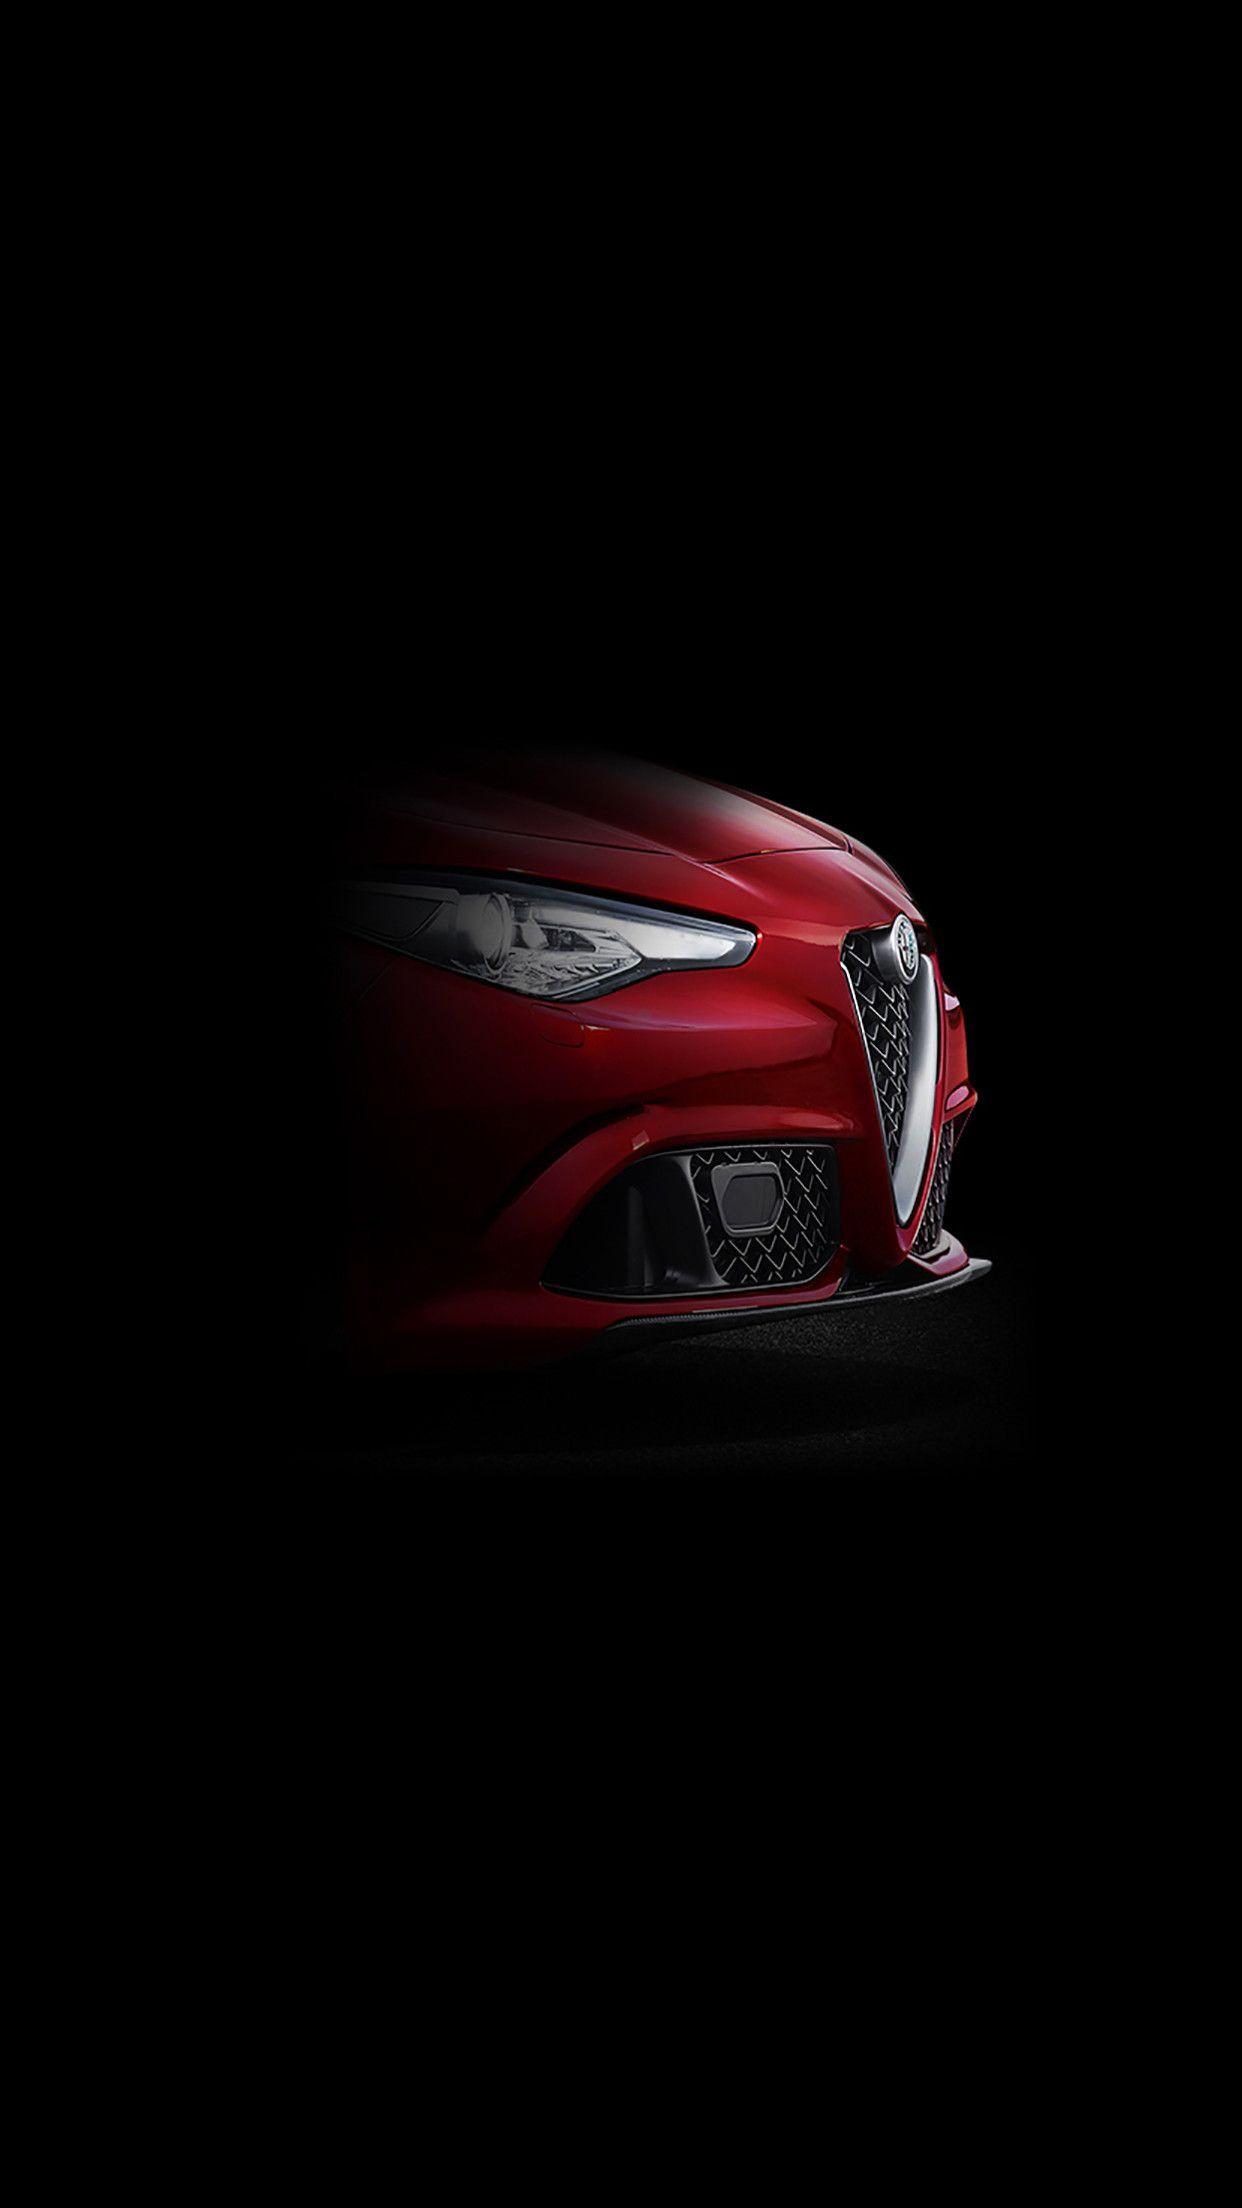 Alfa Romeo Giulia Tecnologia 3wallpapers Iphone P Arallax Alfa